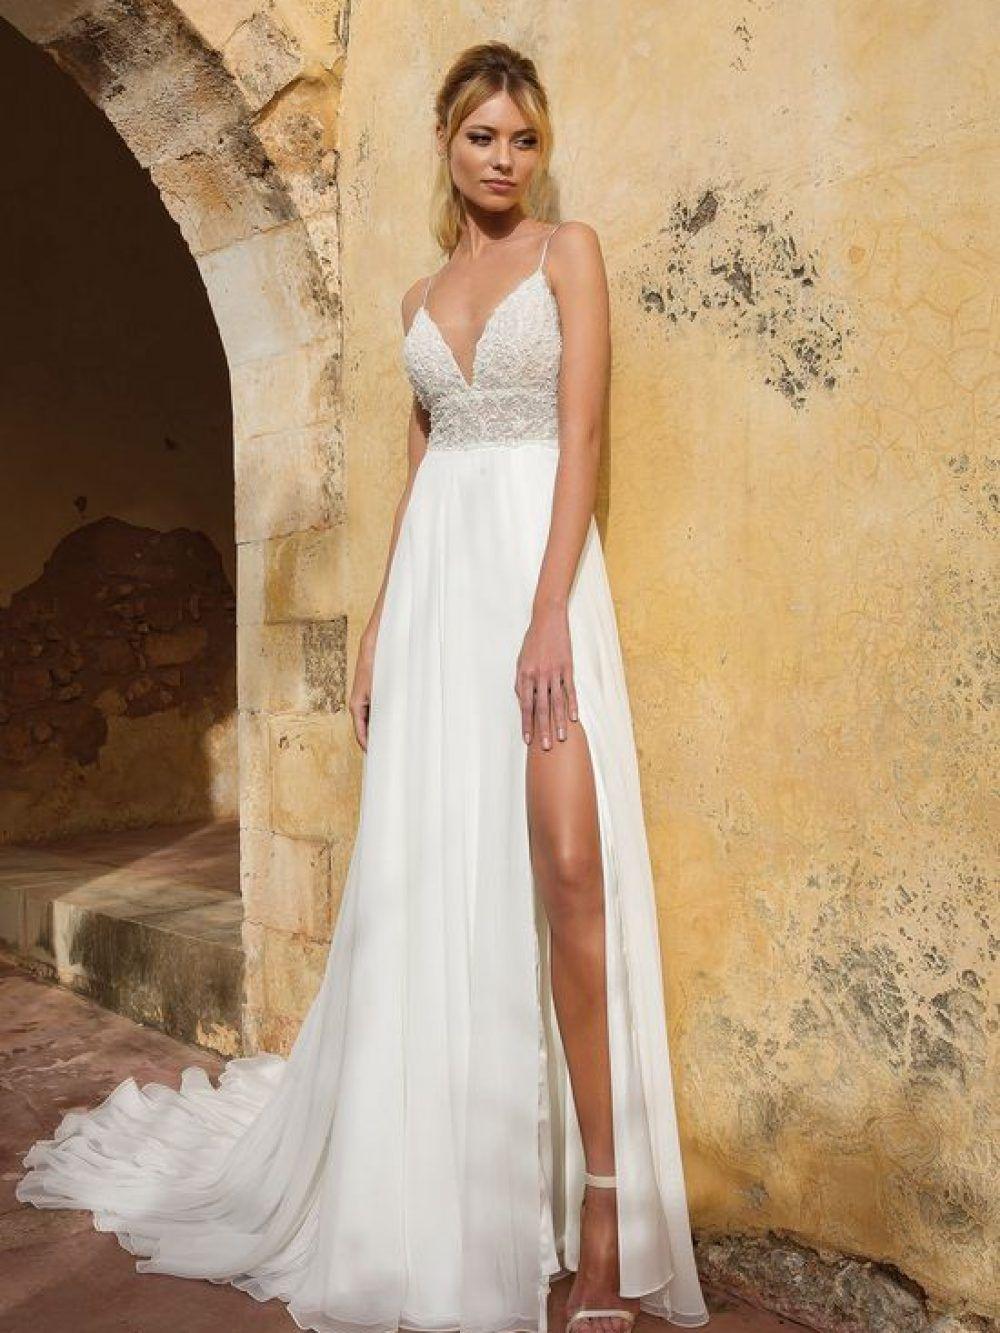 88035 By Justin Alexander Wedding Dresses Justin Alexander Wedding Dress Wedding Dresses Justin Alexander Bridal